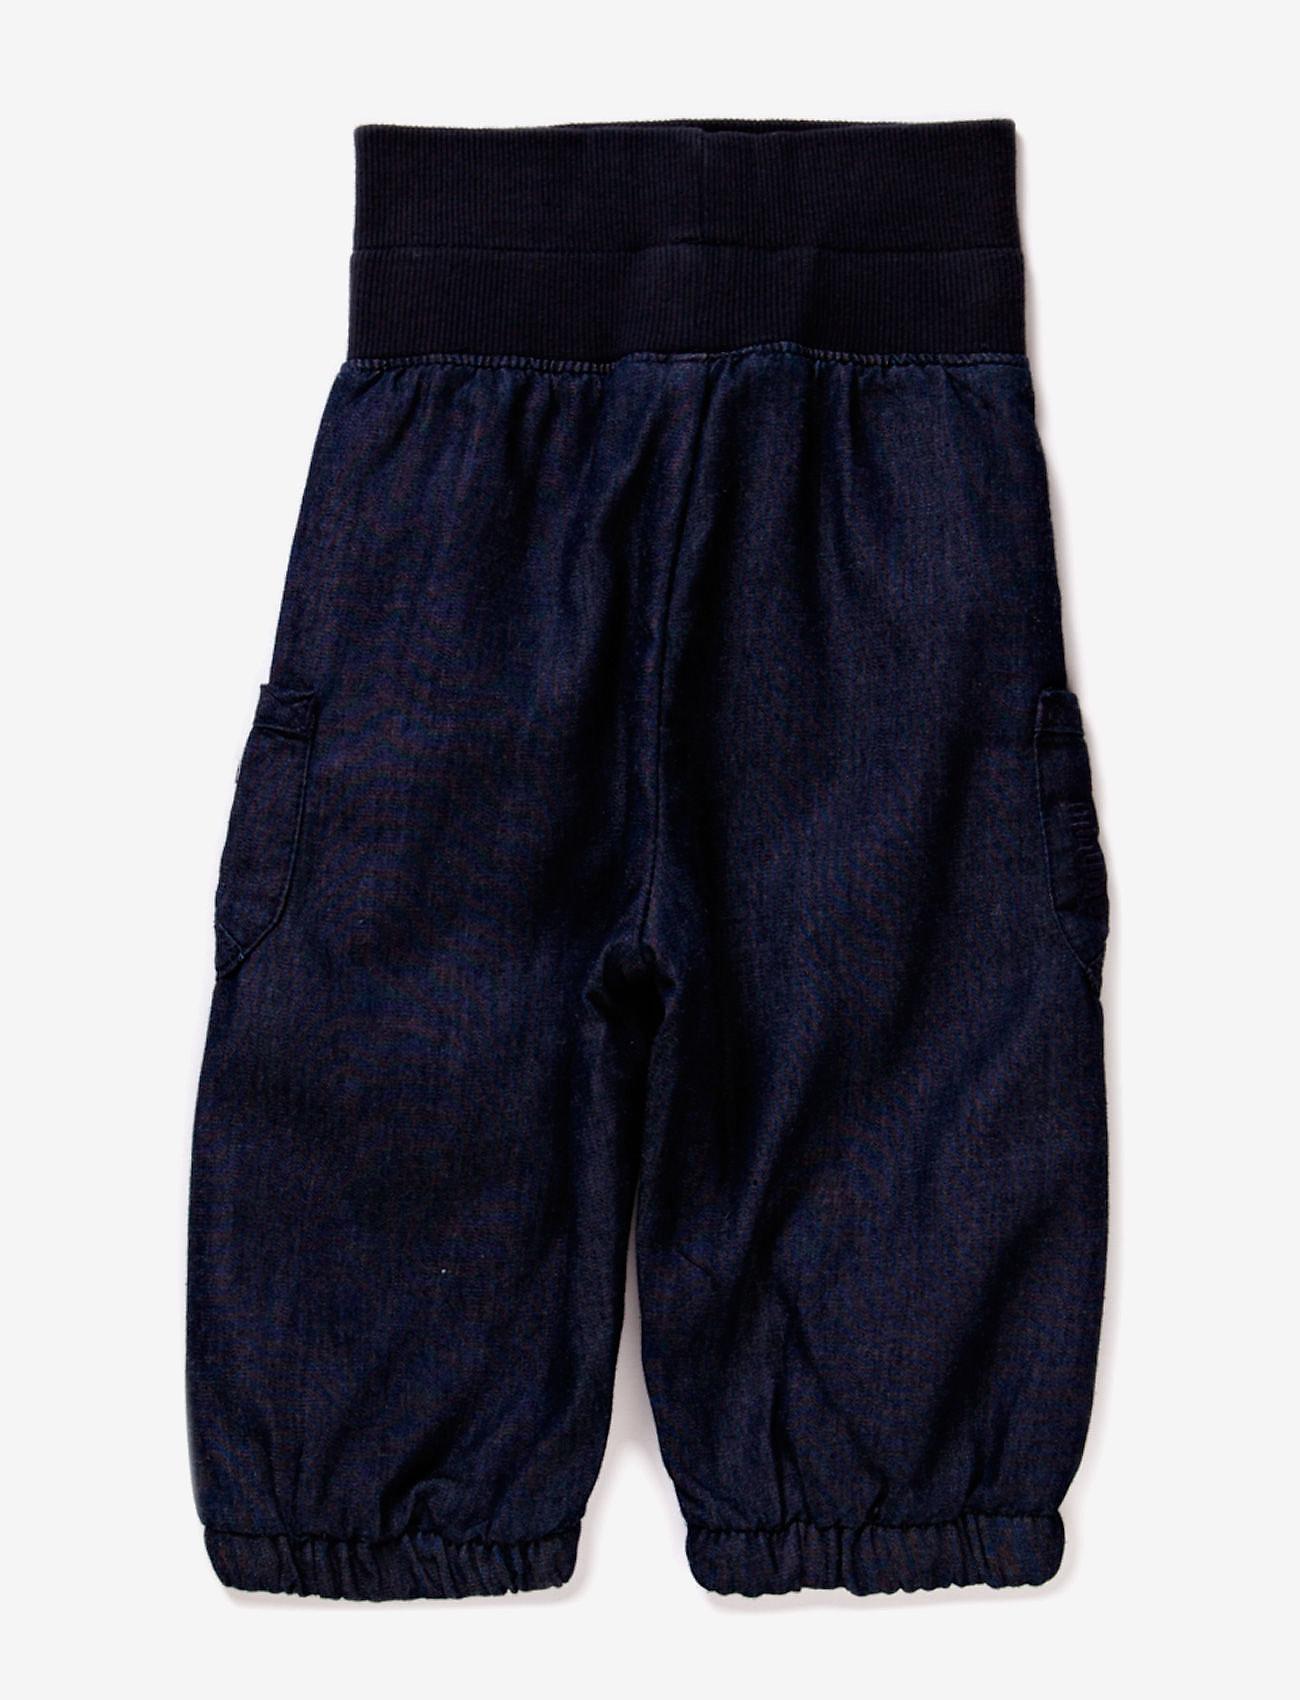 Minymo - Baggy pants -UNISEX - bikses - dark blue - 1